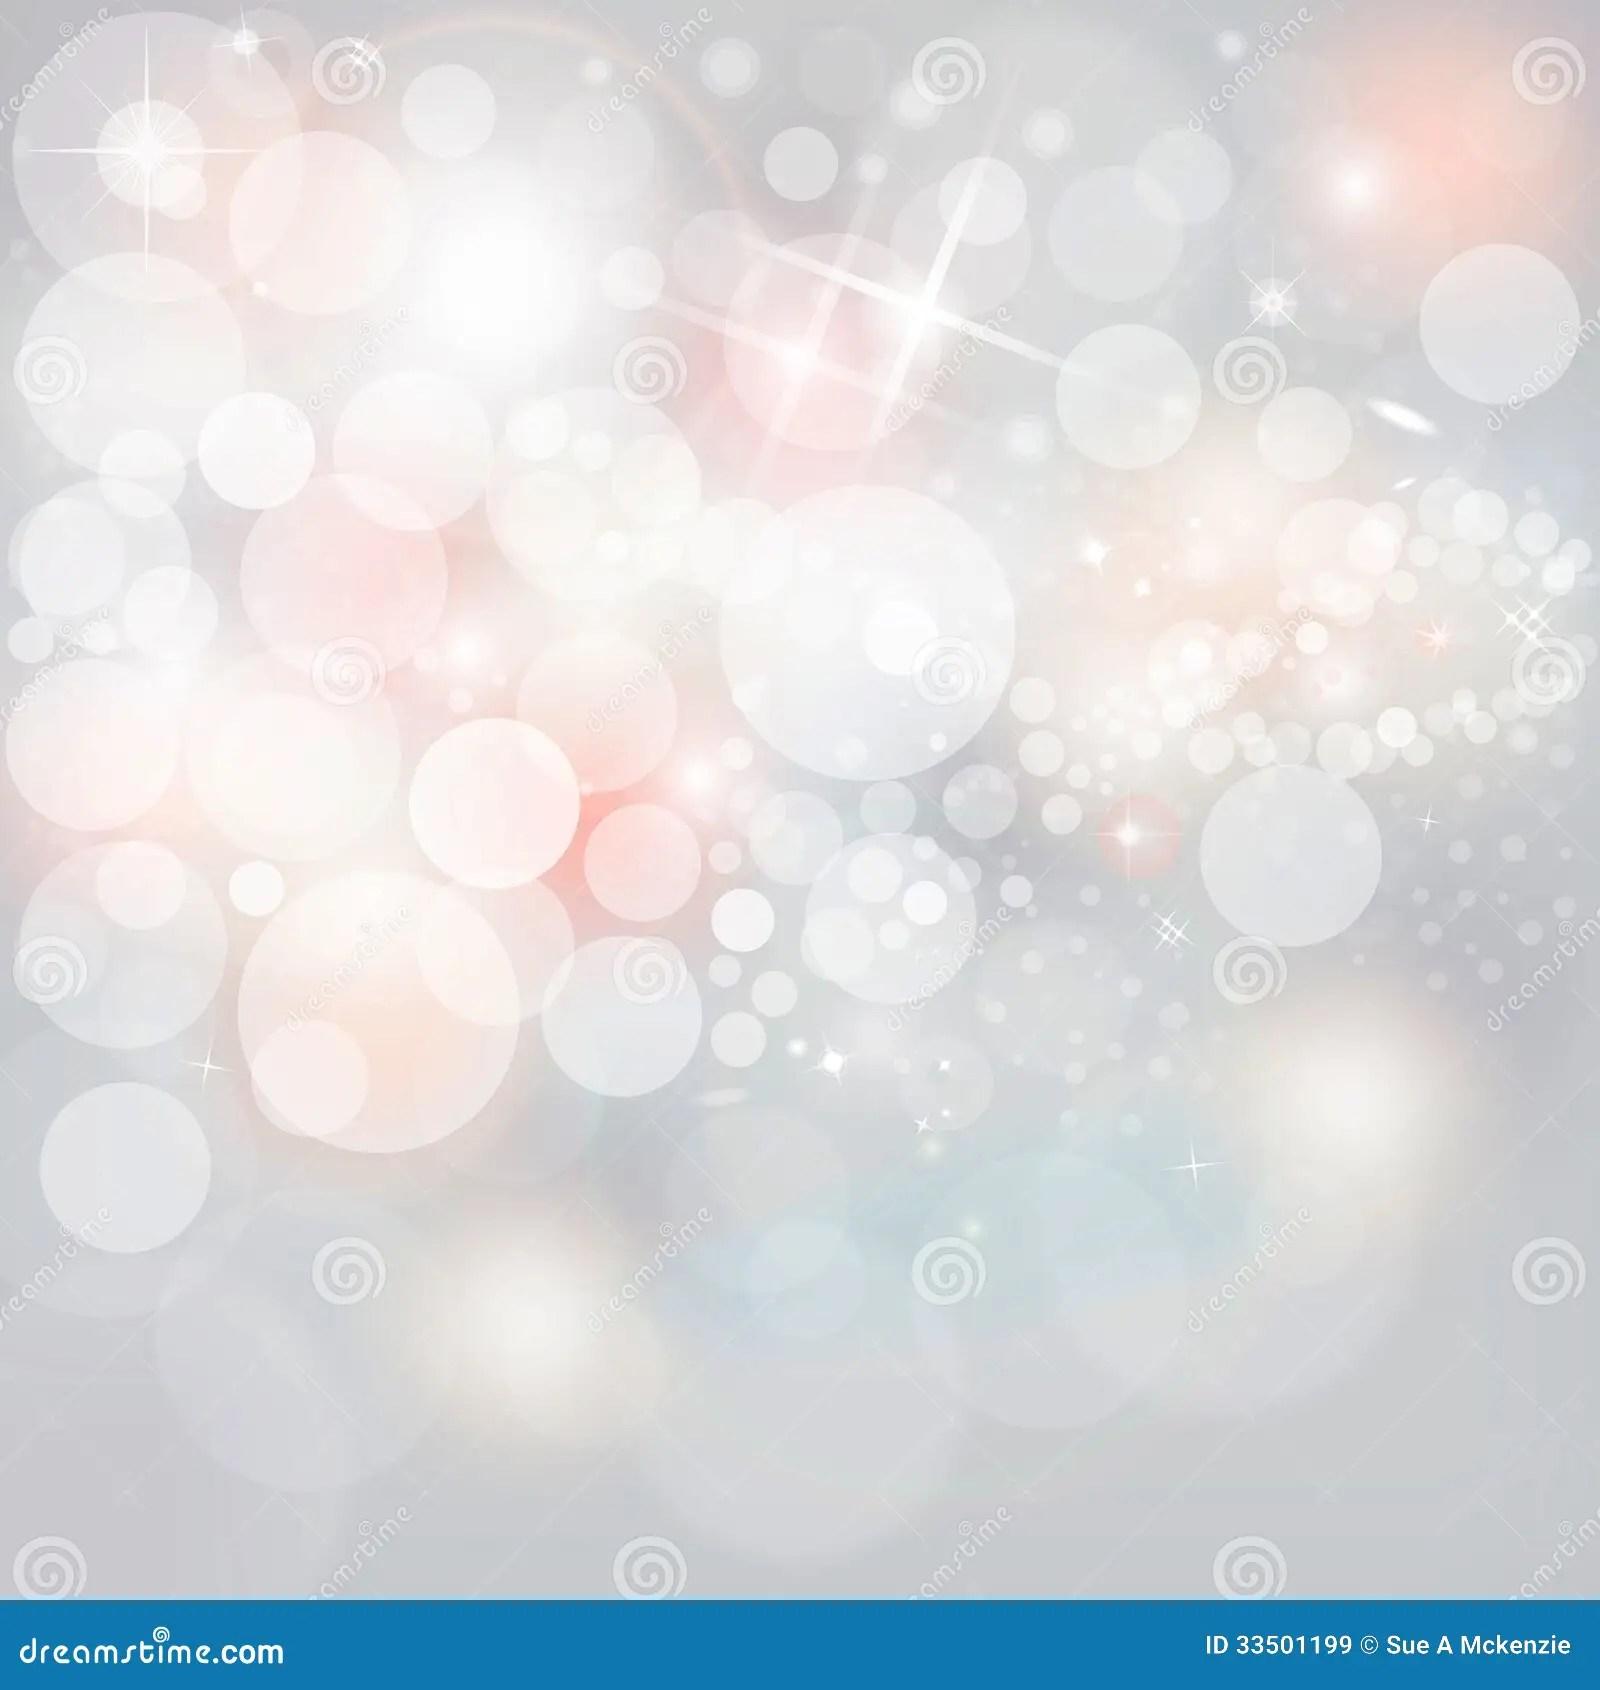 Purple Falling Circles Wallpaper Silver Lights Amp Stars On Neutral Grey Christmas Holiday